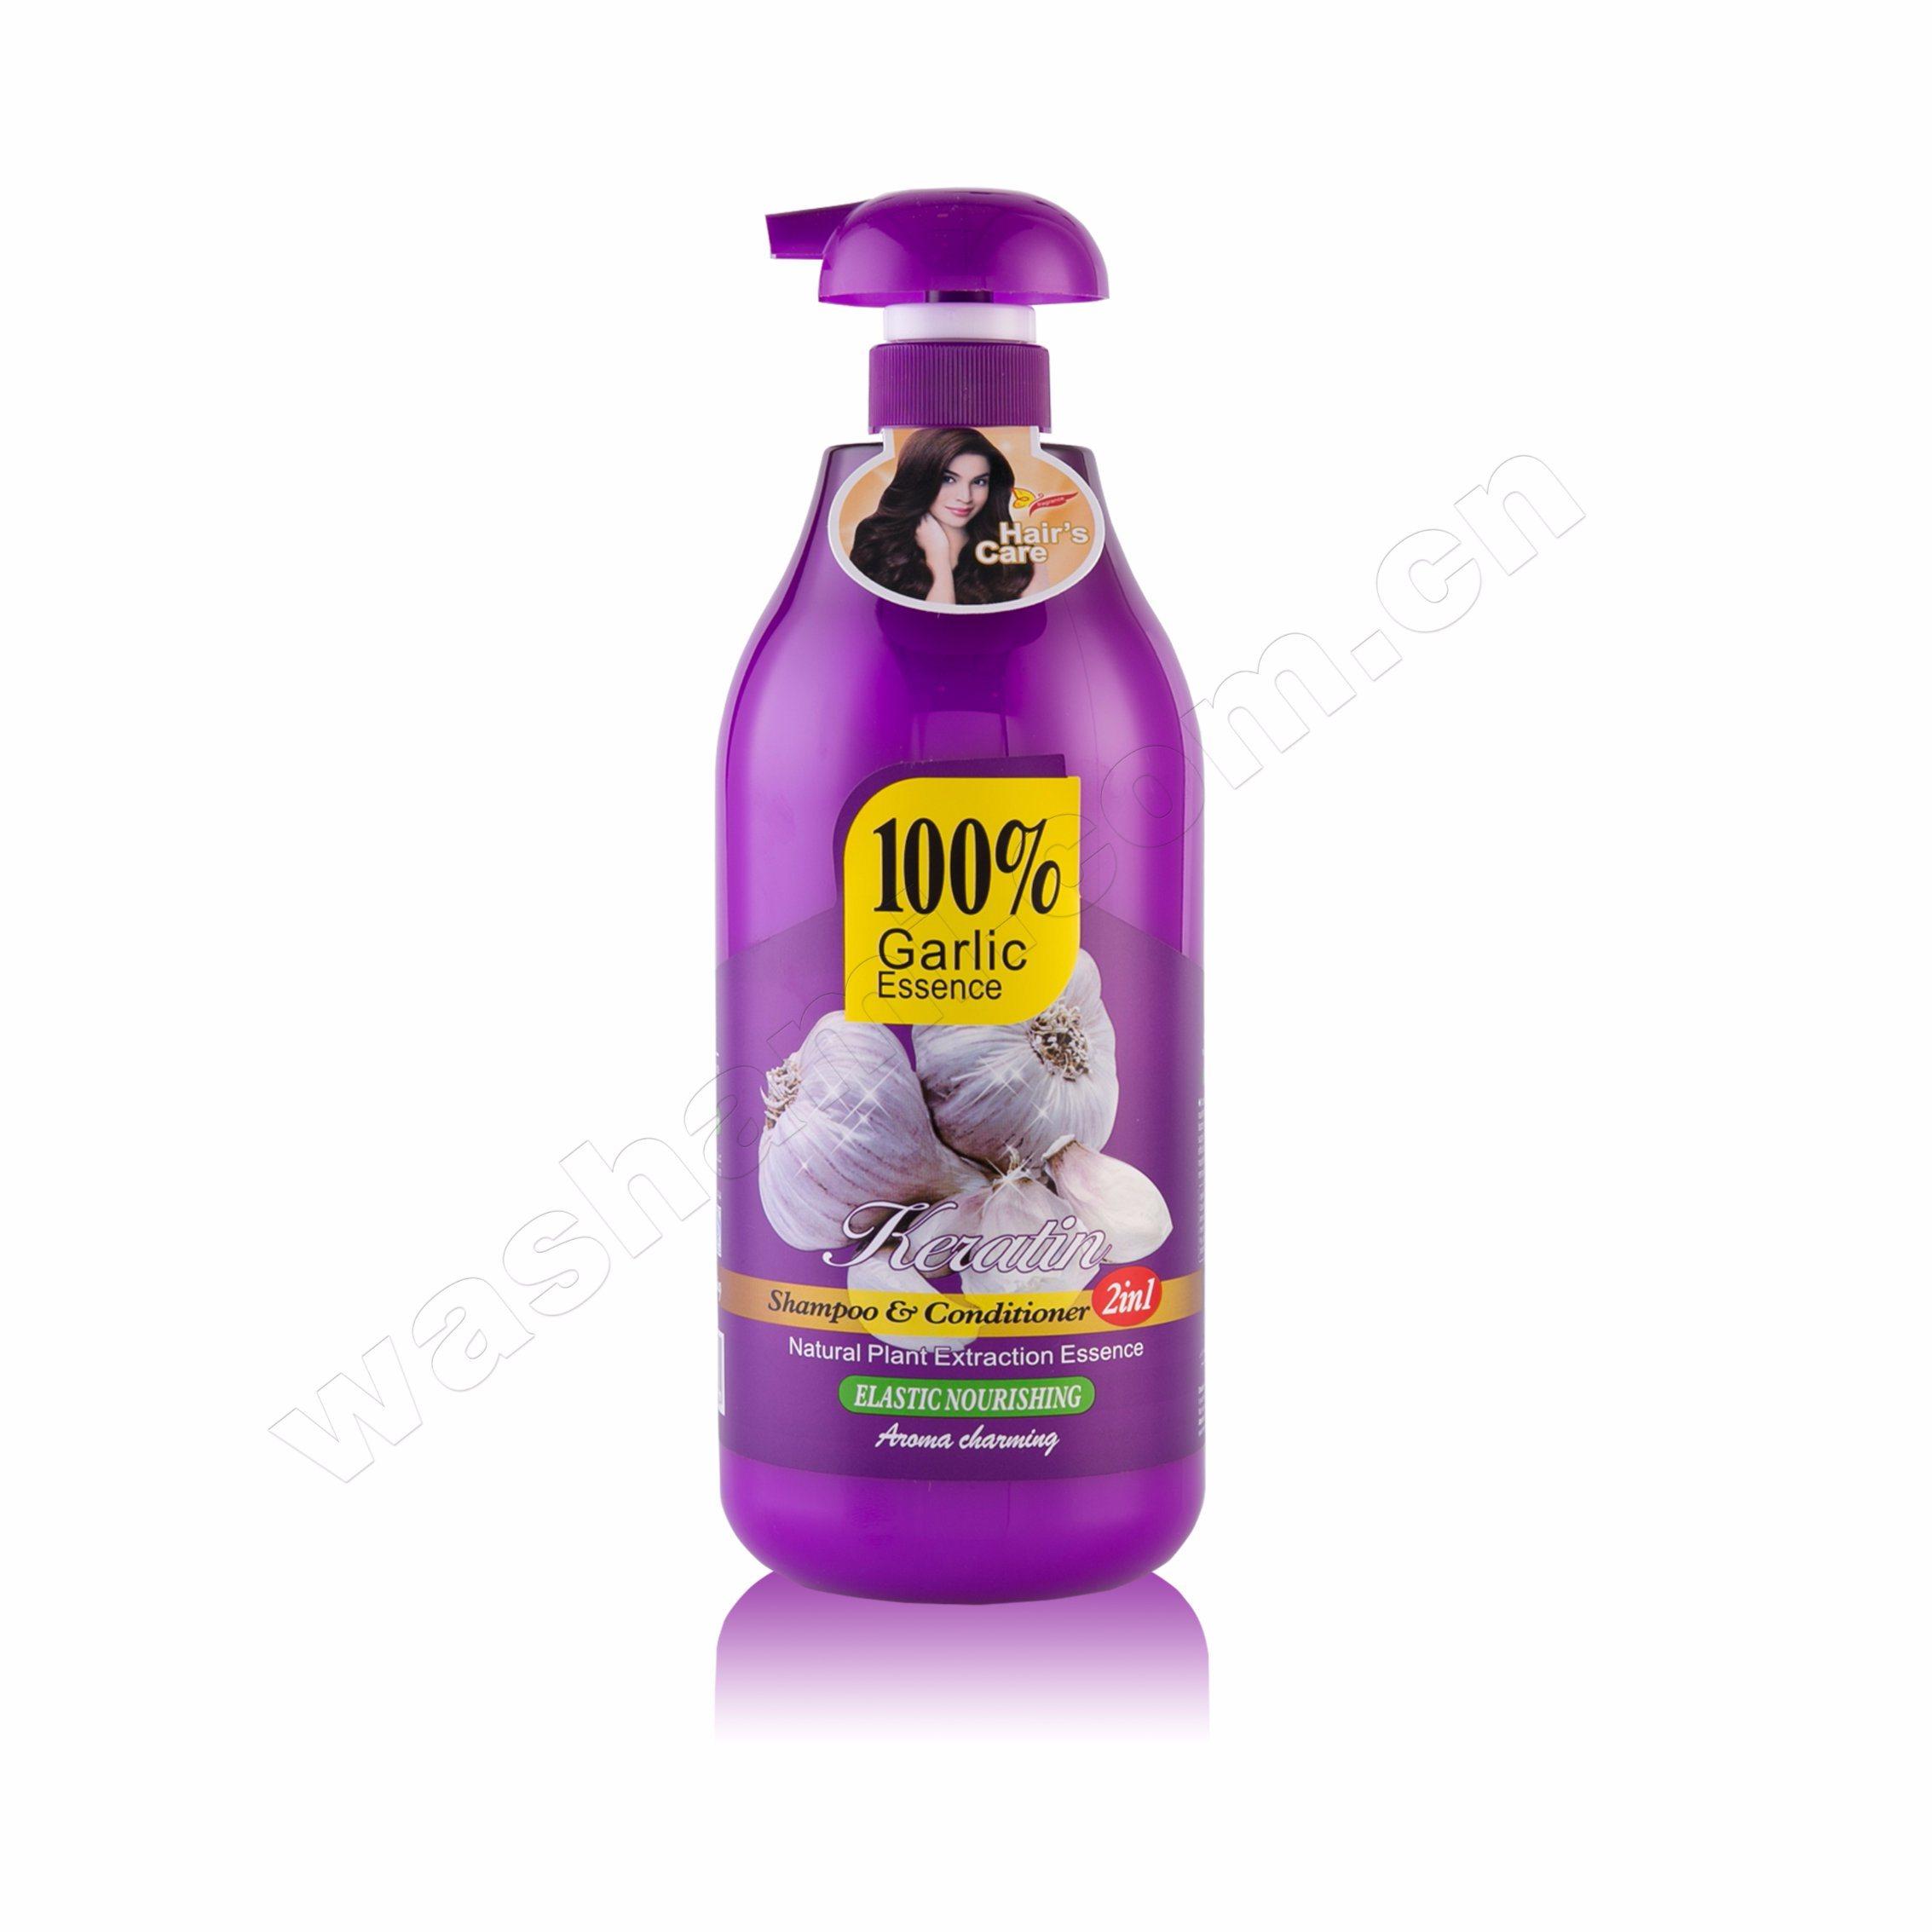 Washami Hair Keratin Natural Plant Extracts 2 in 1 Shampoo